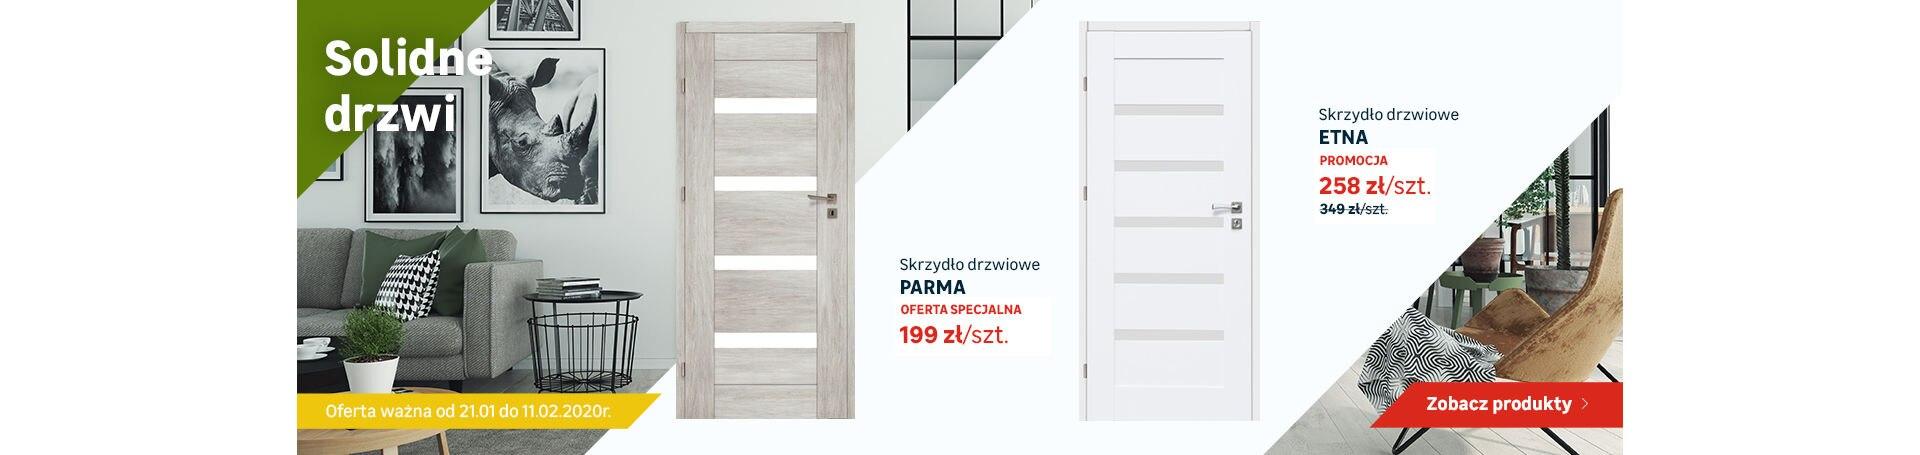 ps-drzwi-21.01-11.02-1323x455